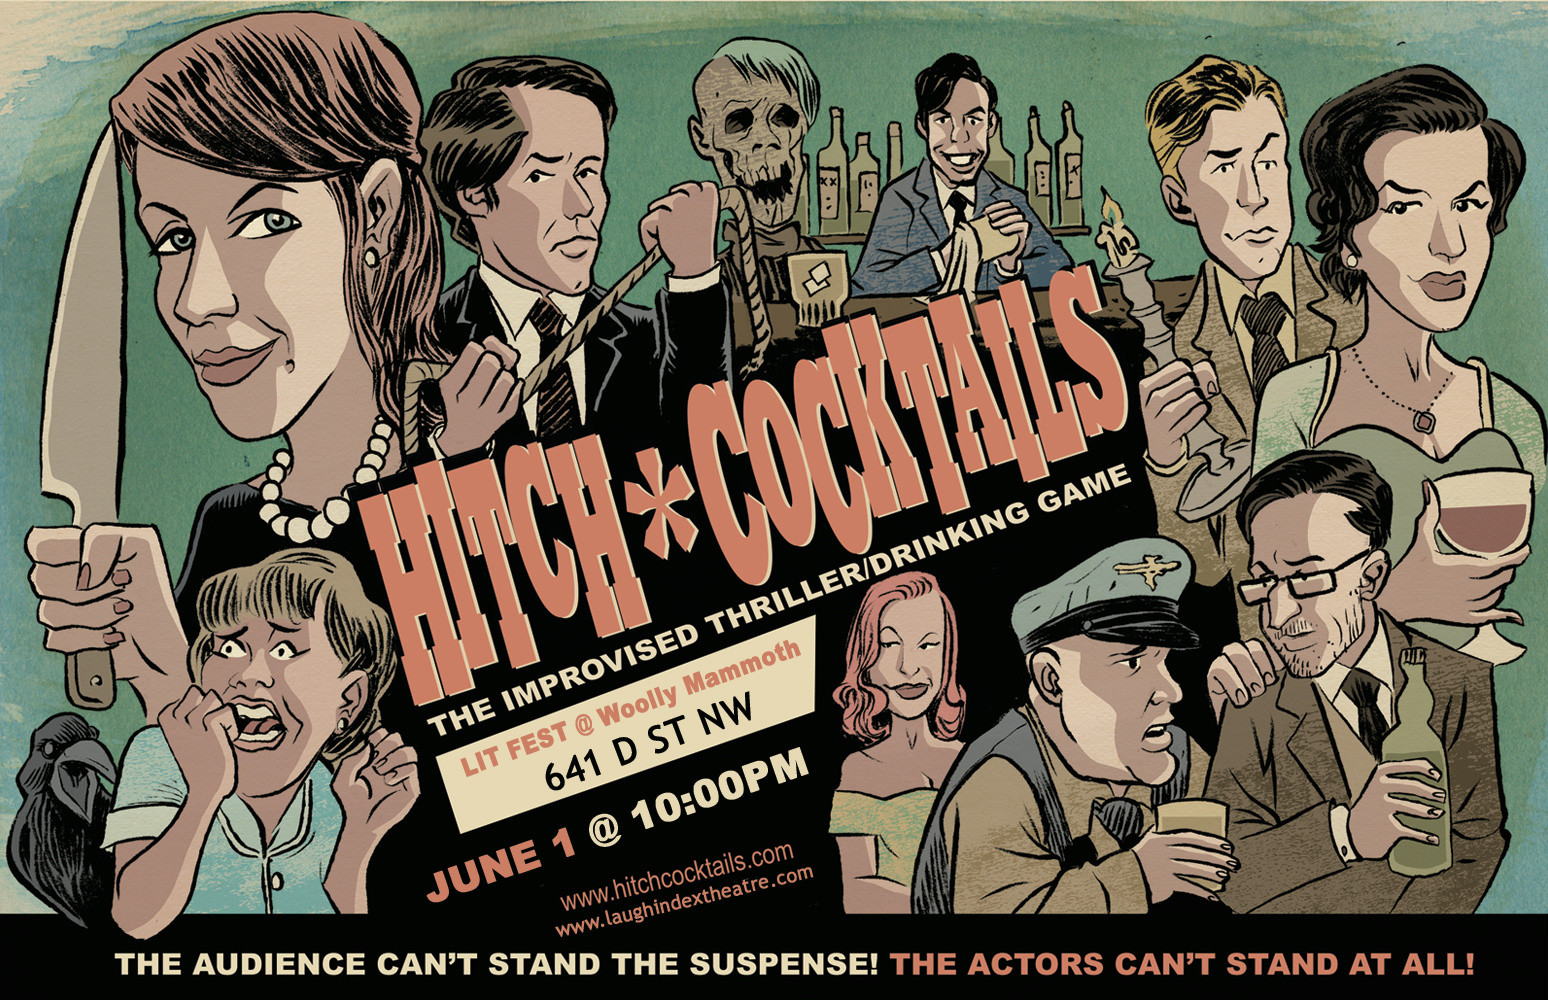 Hitch*Cocktails - Show #2